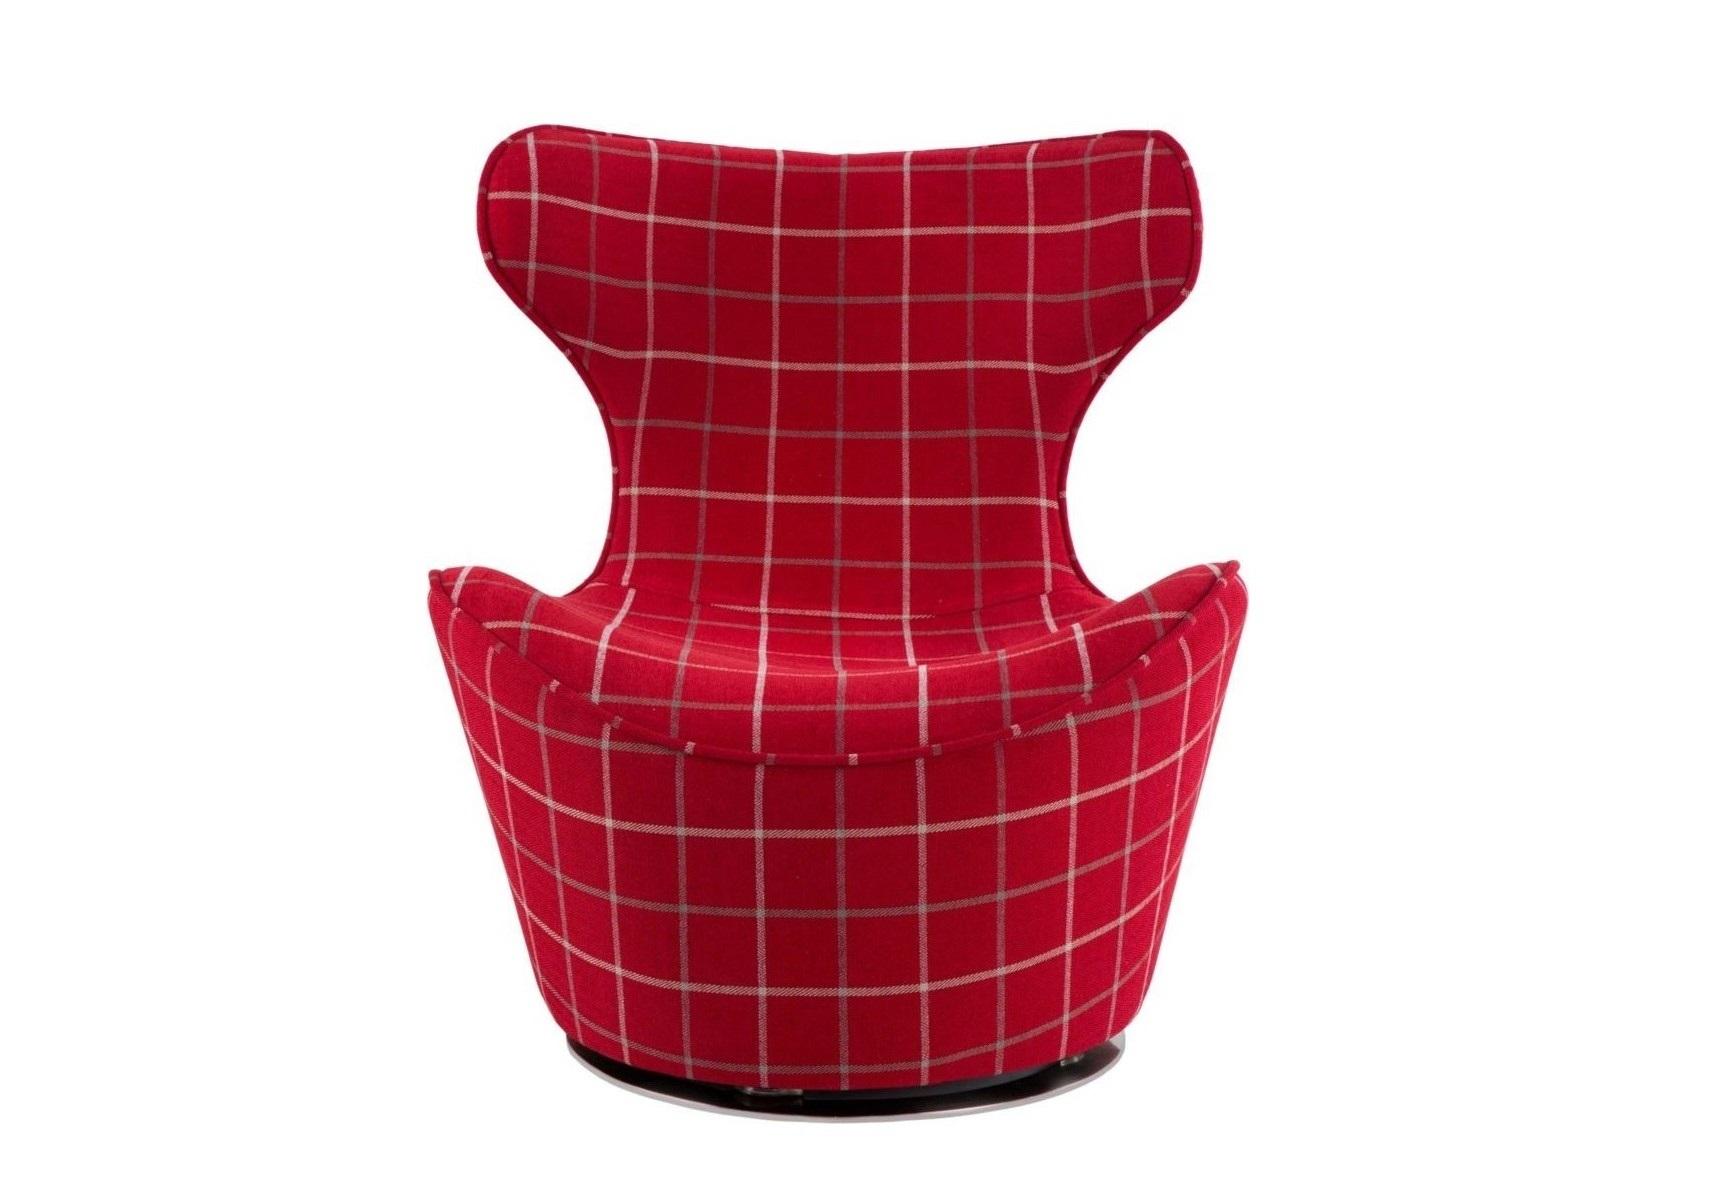 Кресло SerenityИнтерьерные кресла<br><br><br>Material: Текстиль<br>Width см: 75<br>Depth см: 74<br>Height см: 83